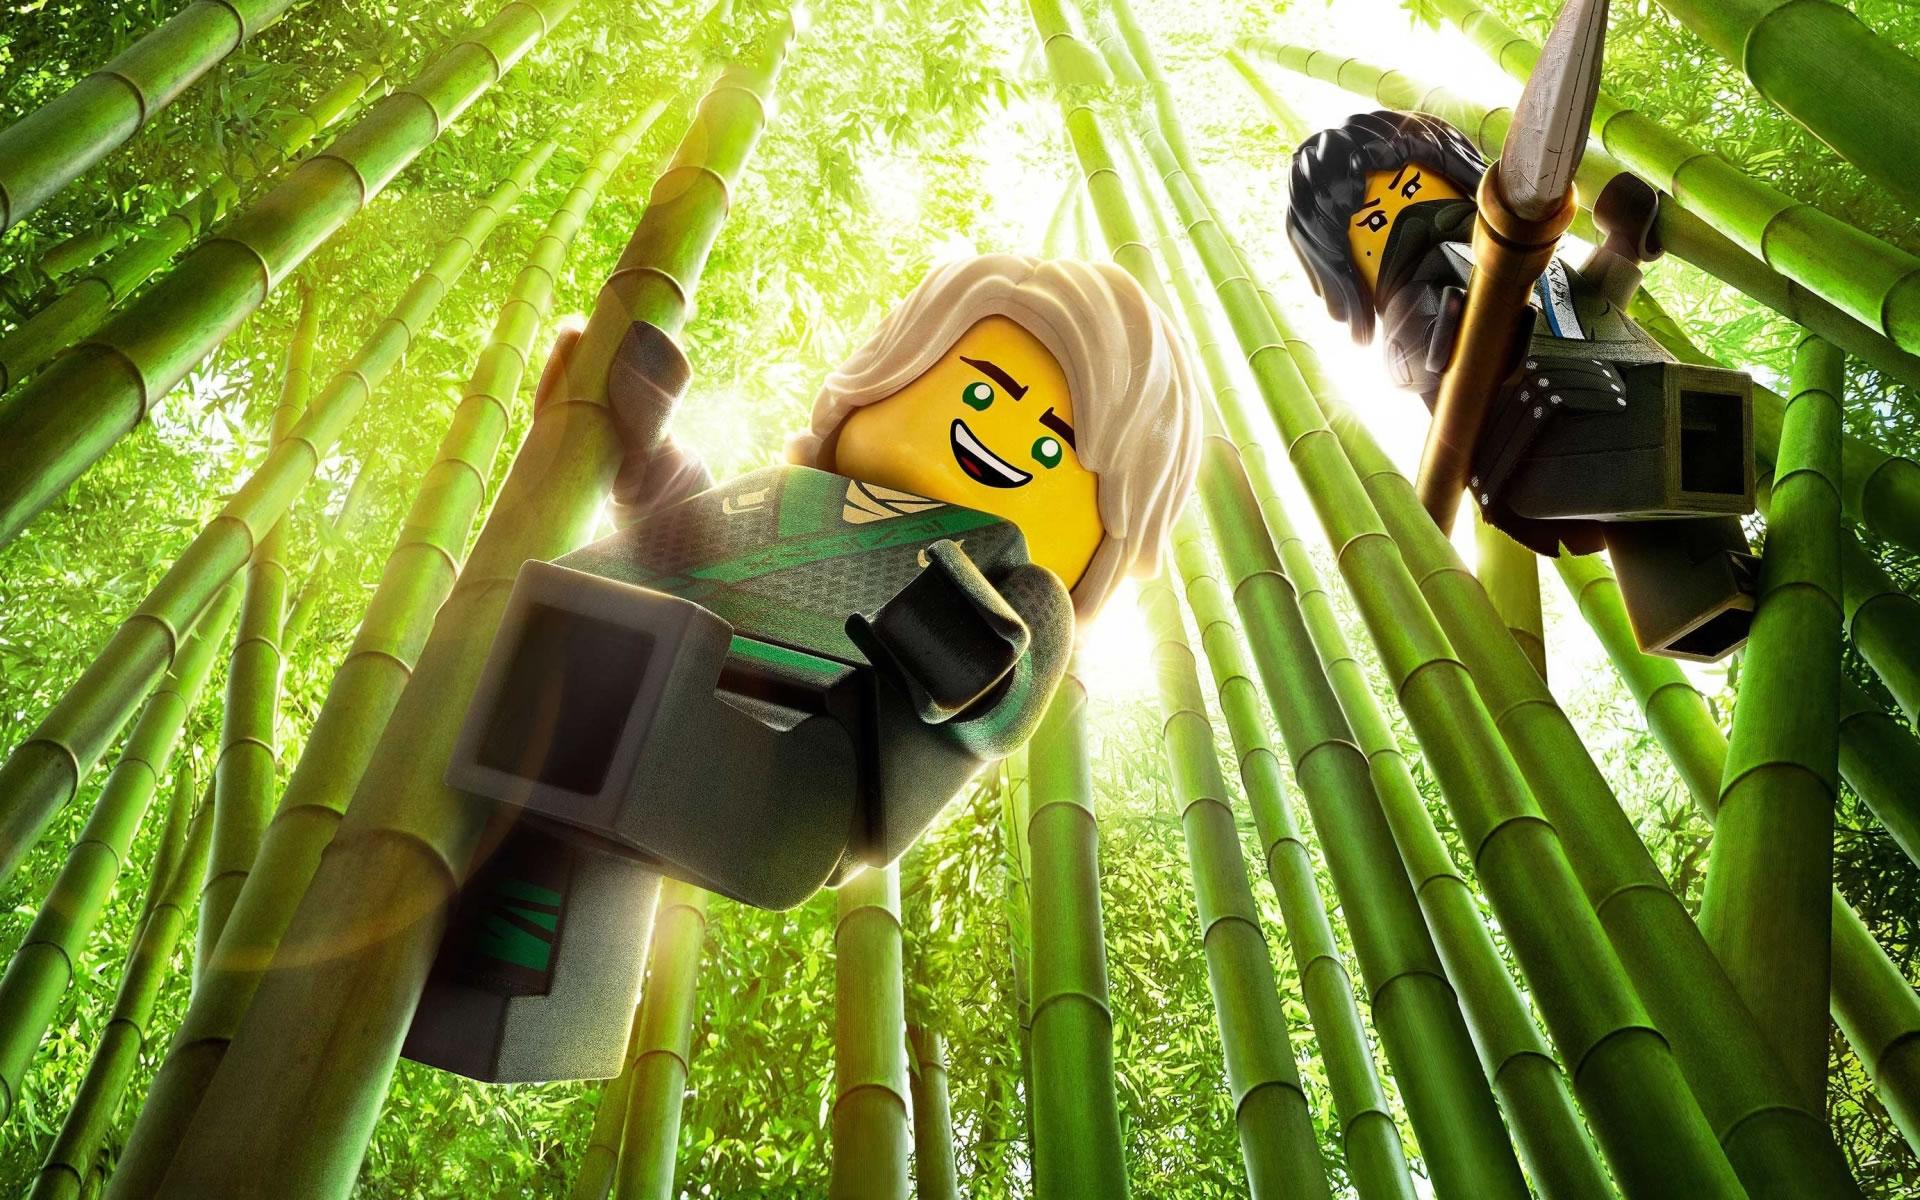 download wallpaper: LEGO Ninjago Movie wallpaper